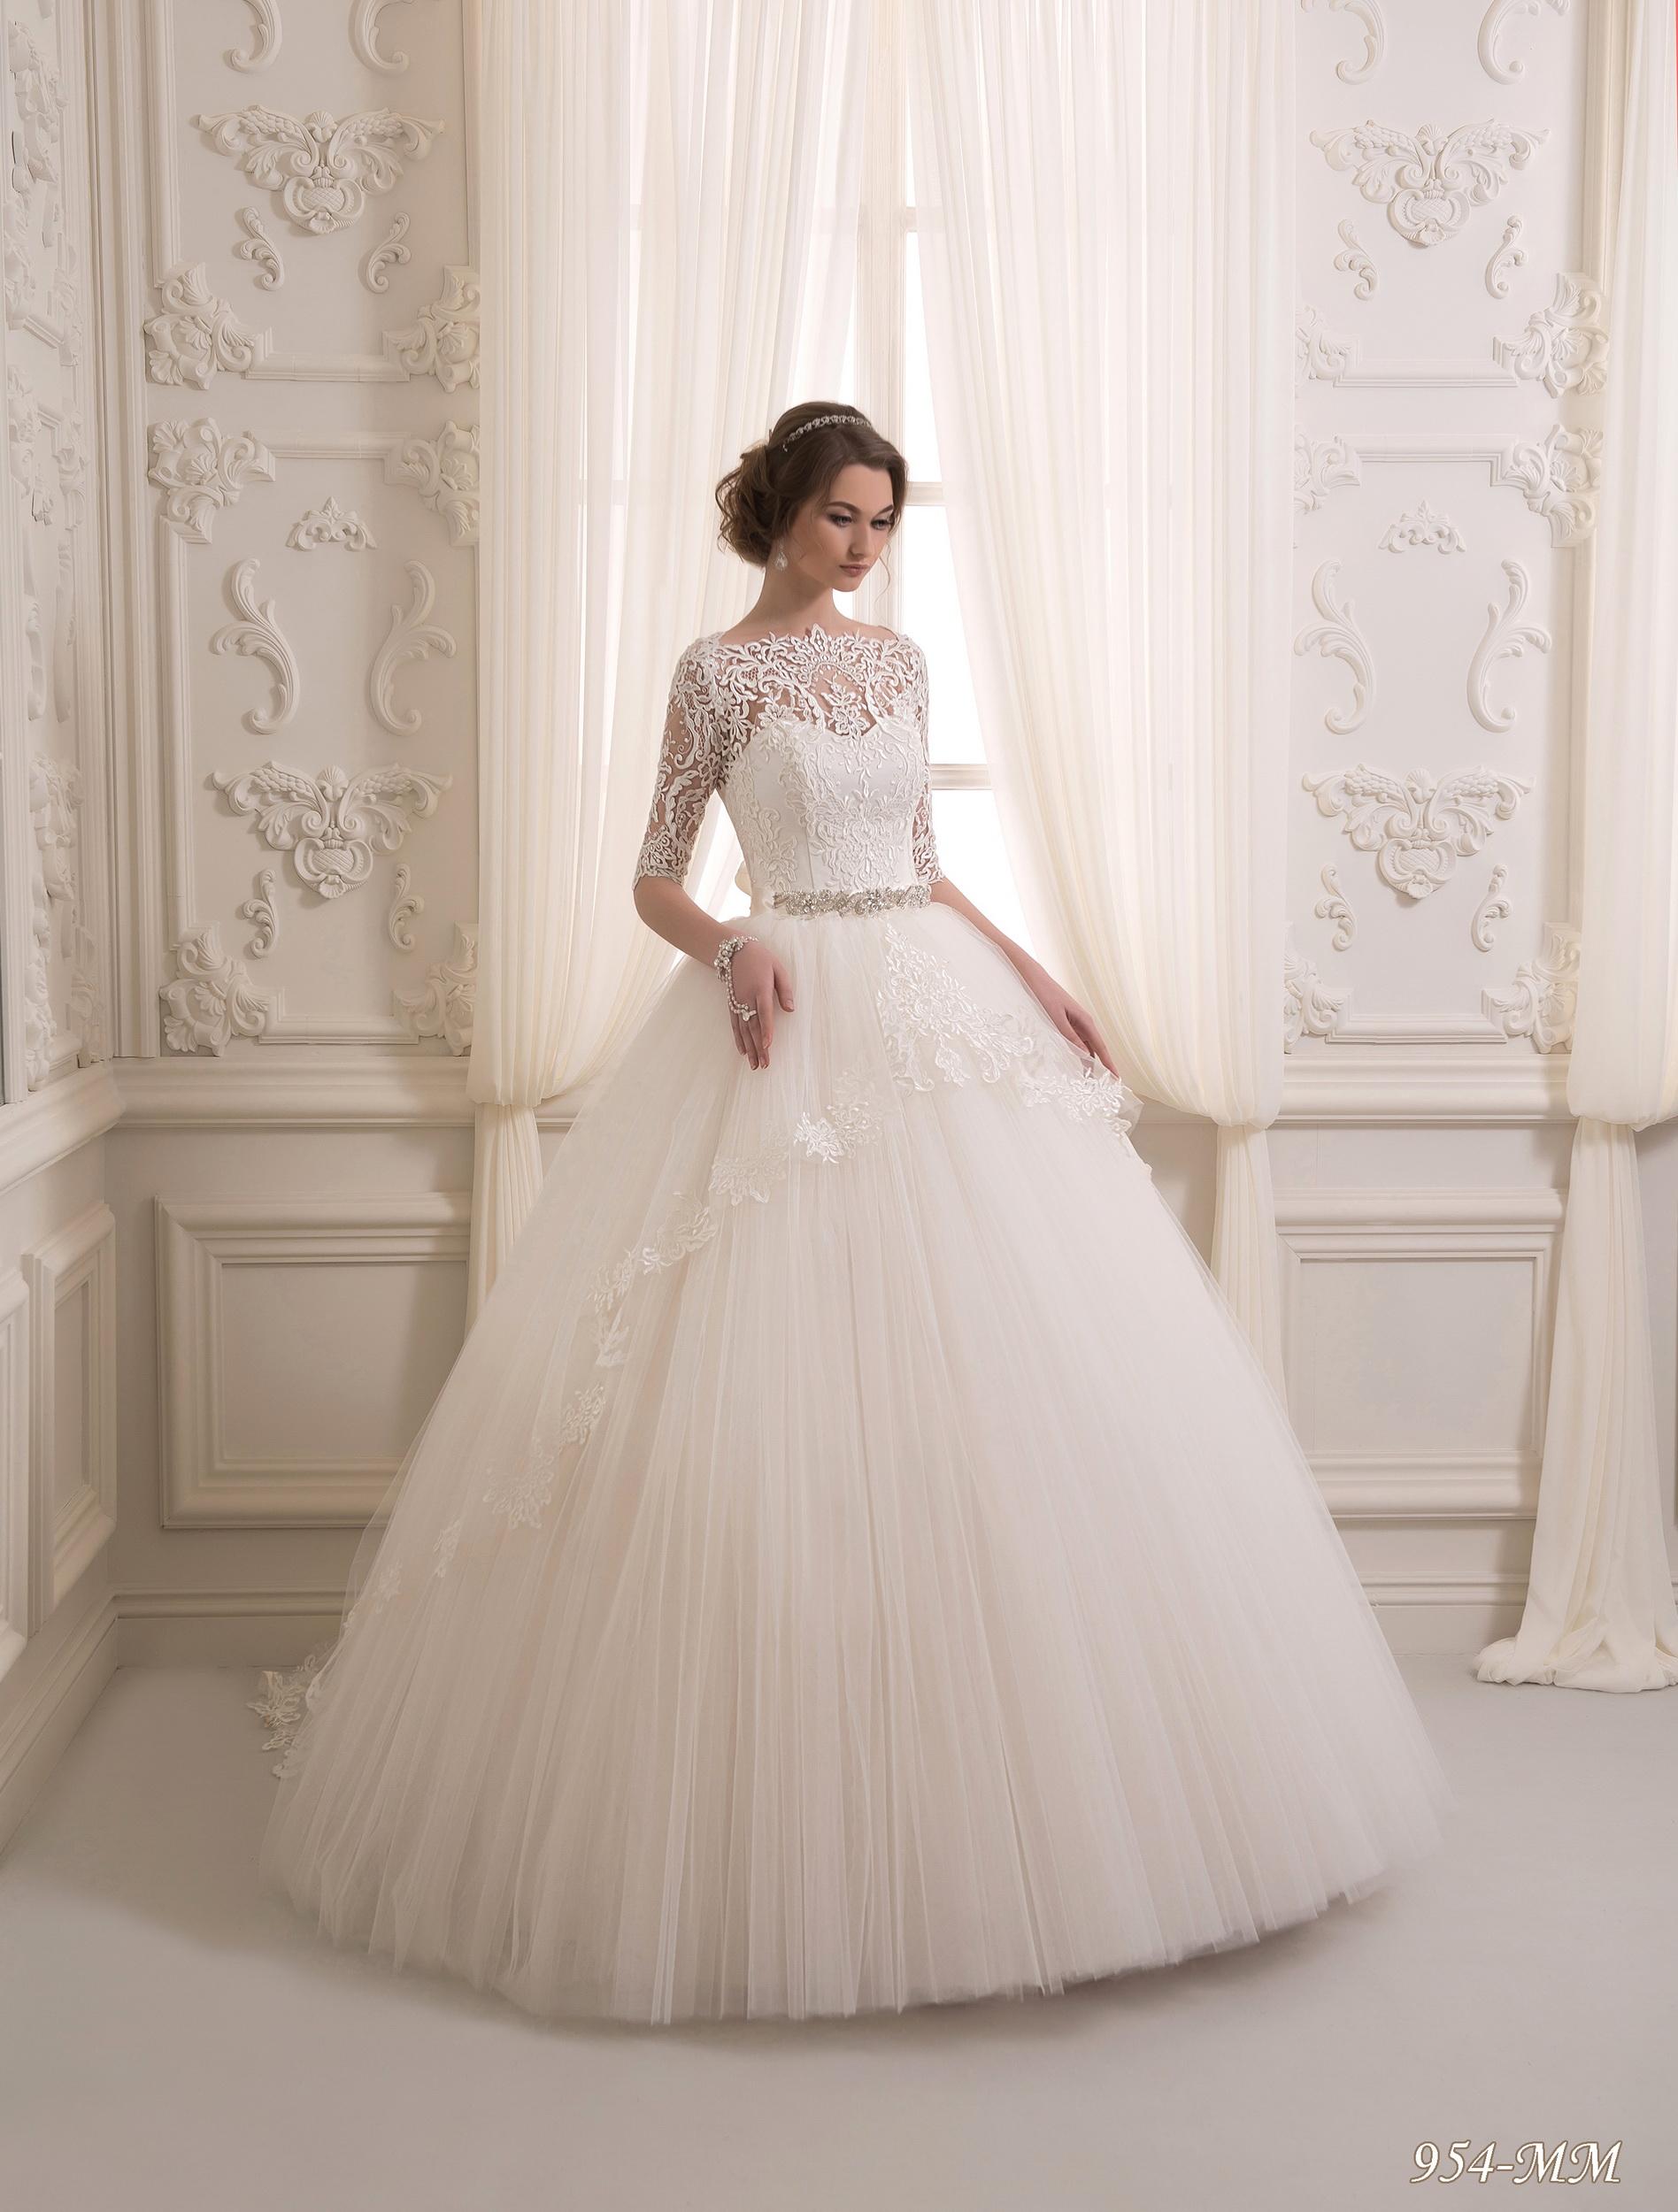 954-MM | Buy wedding dresses wholesale from Pentelei